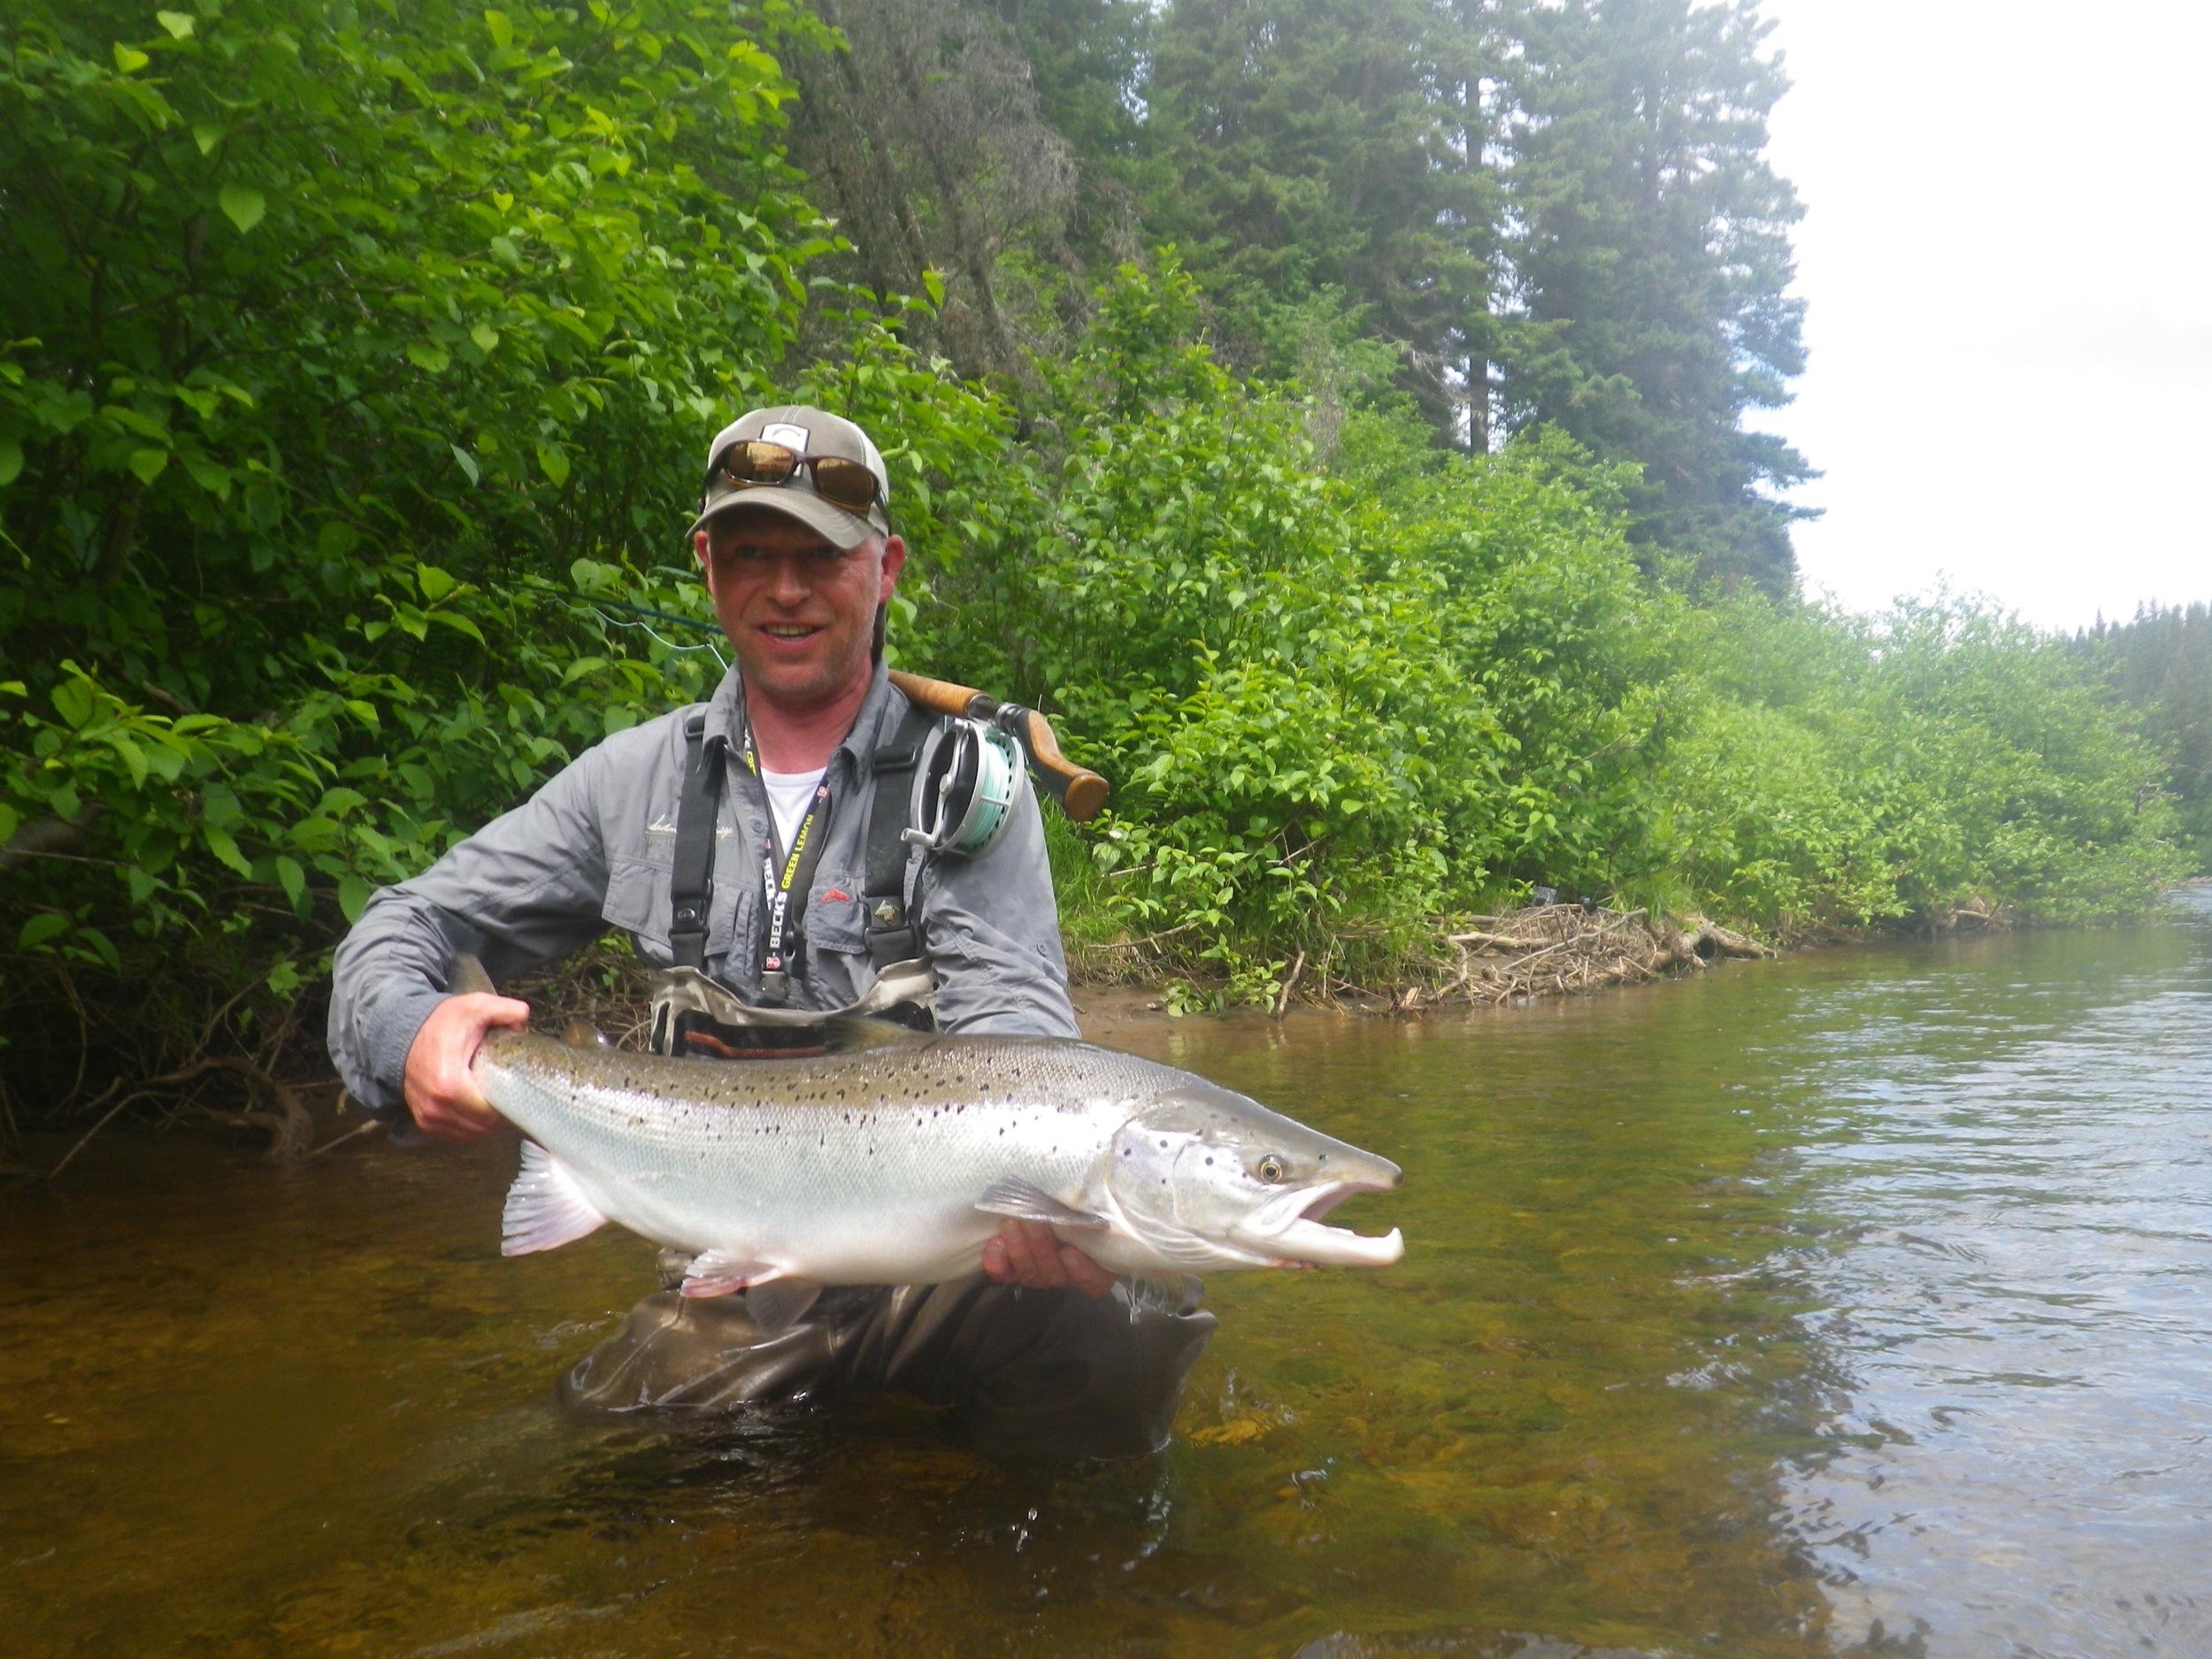 Salmon Lodge regular Thomas Mahanke with a fine Grand Cascapedia salmon, Nice fish Thomas!